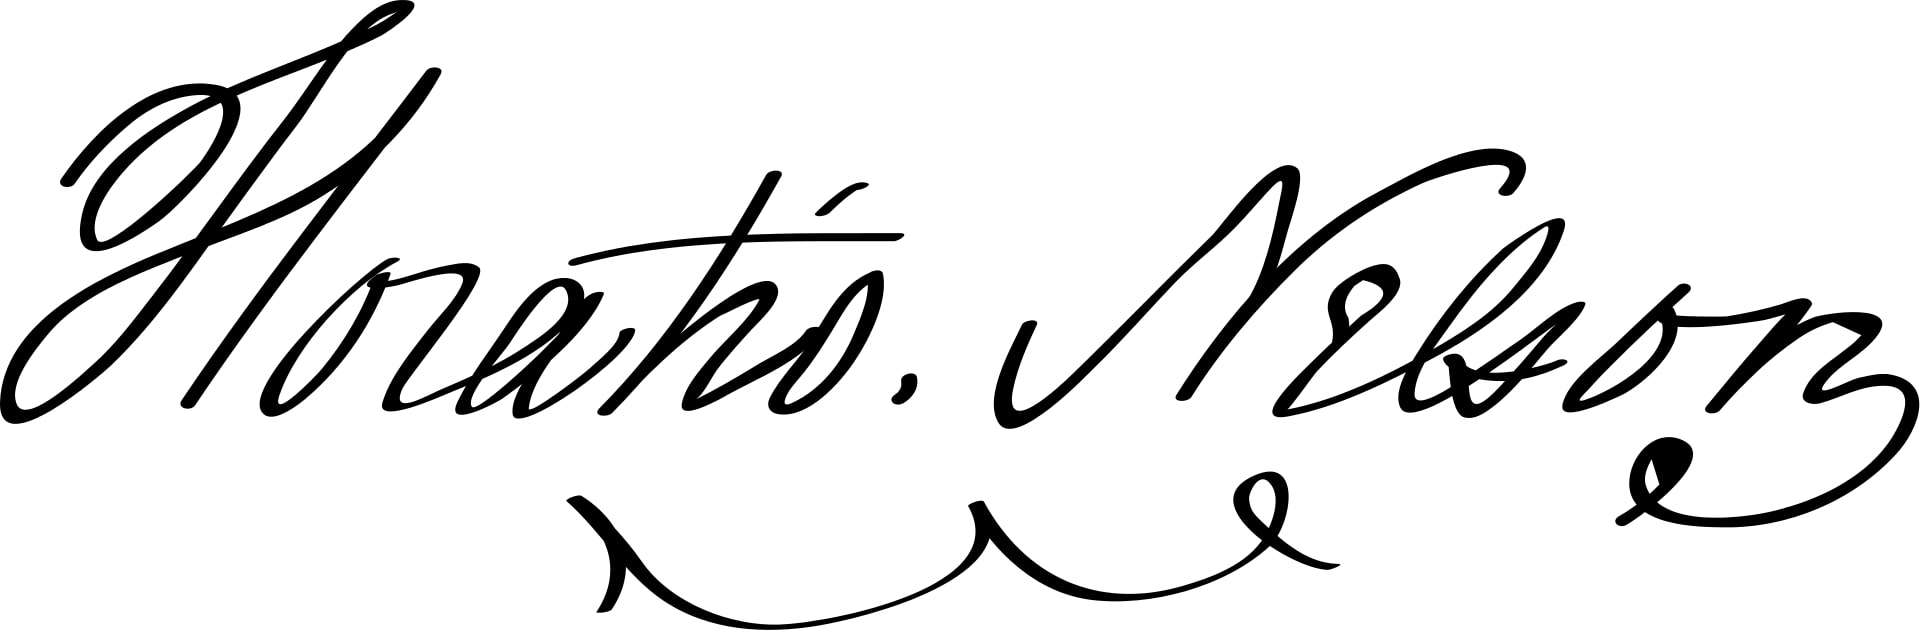 Horatio Nelson, 1st Viscount Nelson Signature